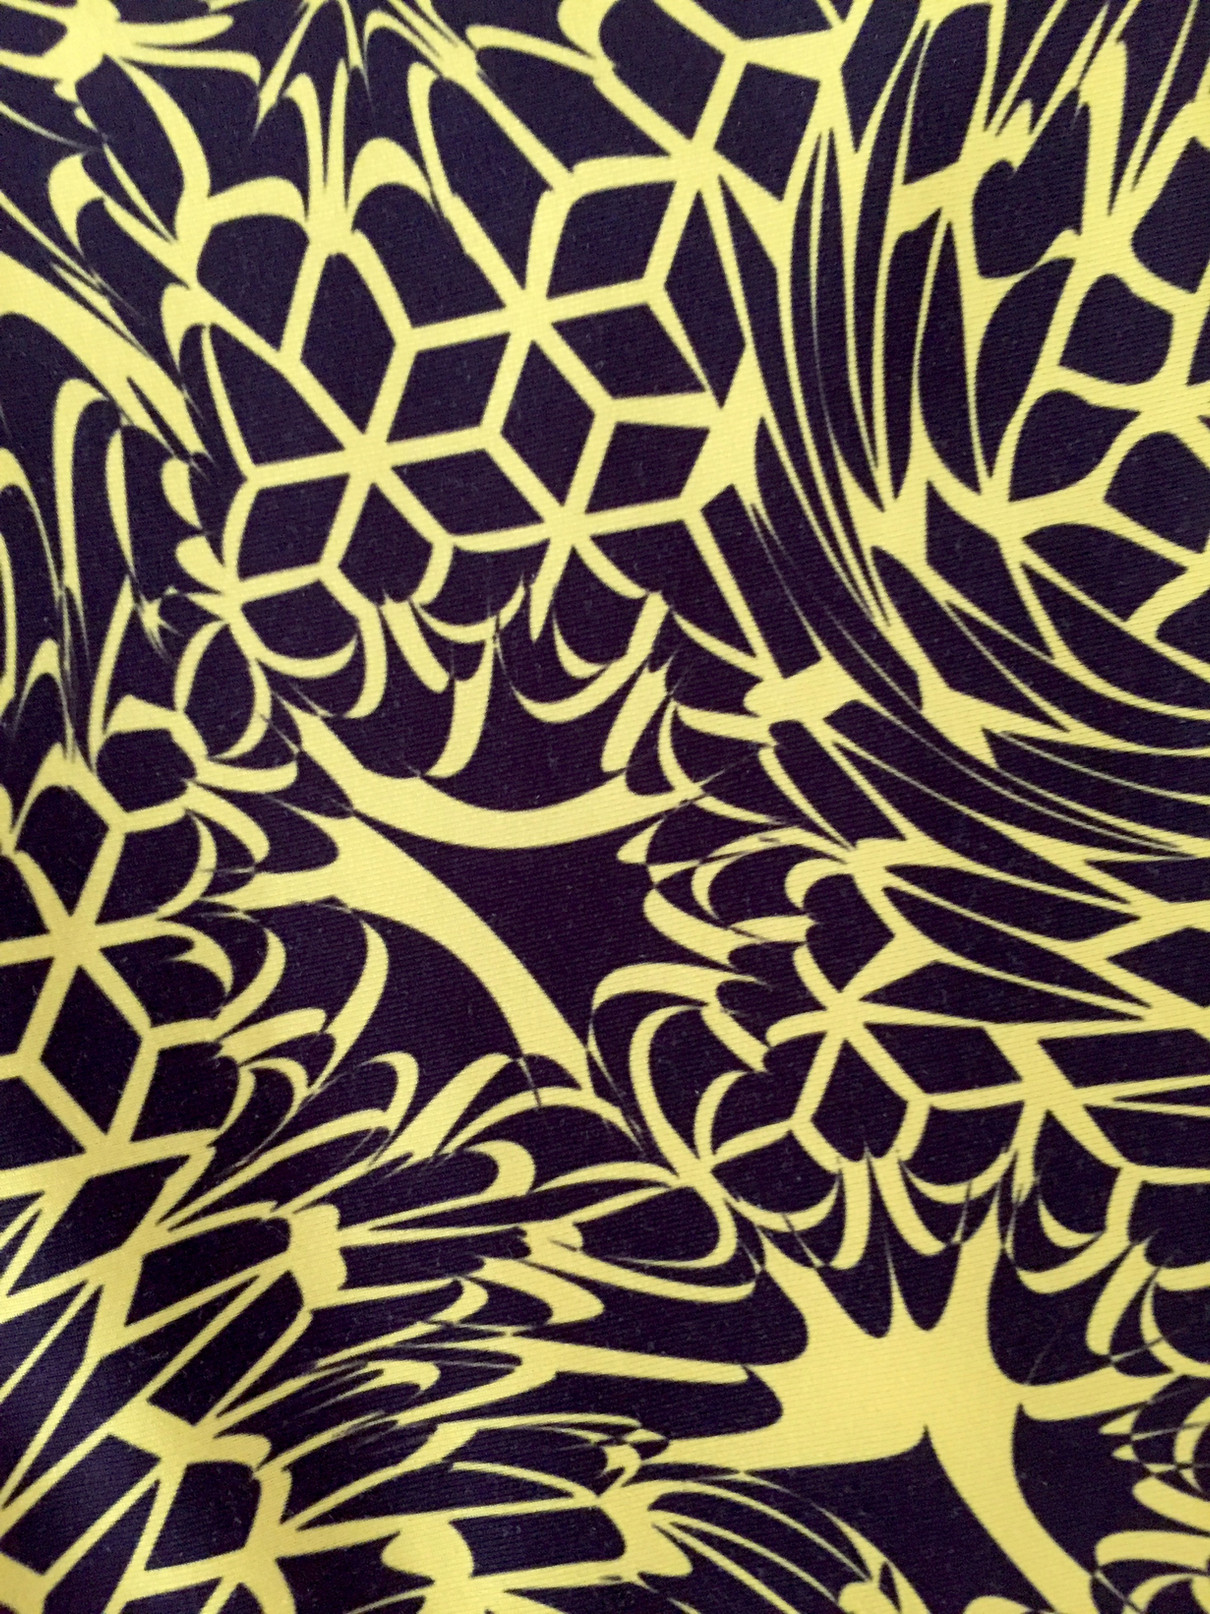 Pattern_YellowBlack.jpg